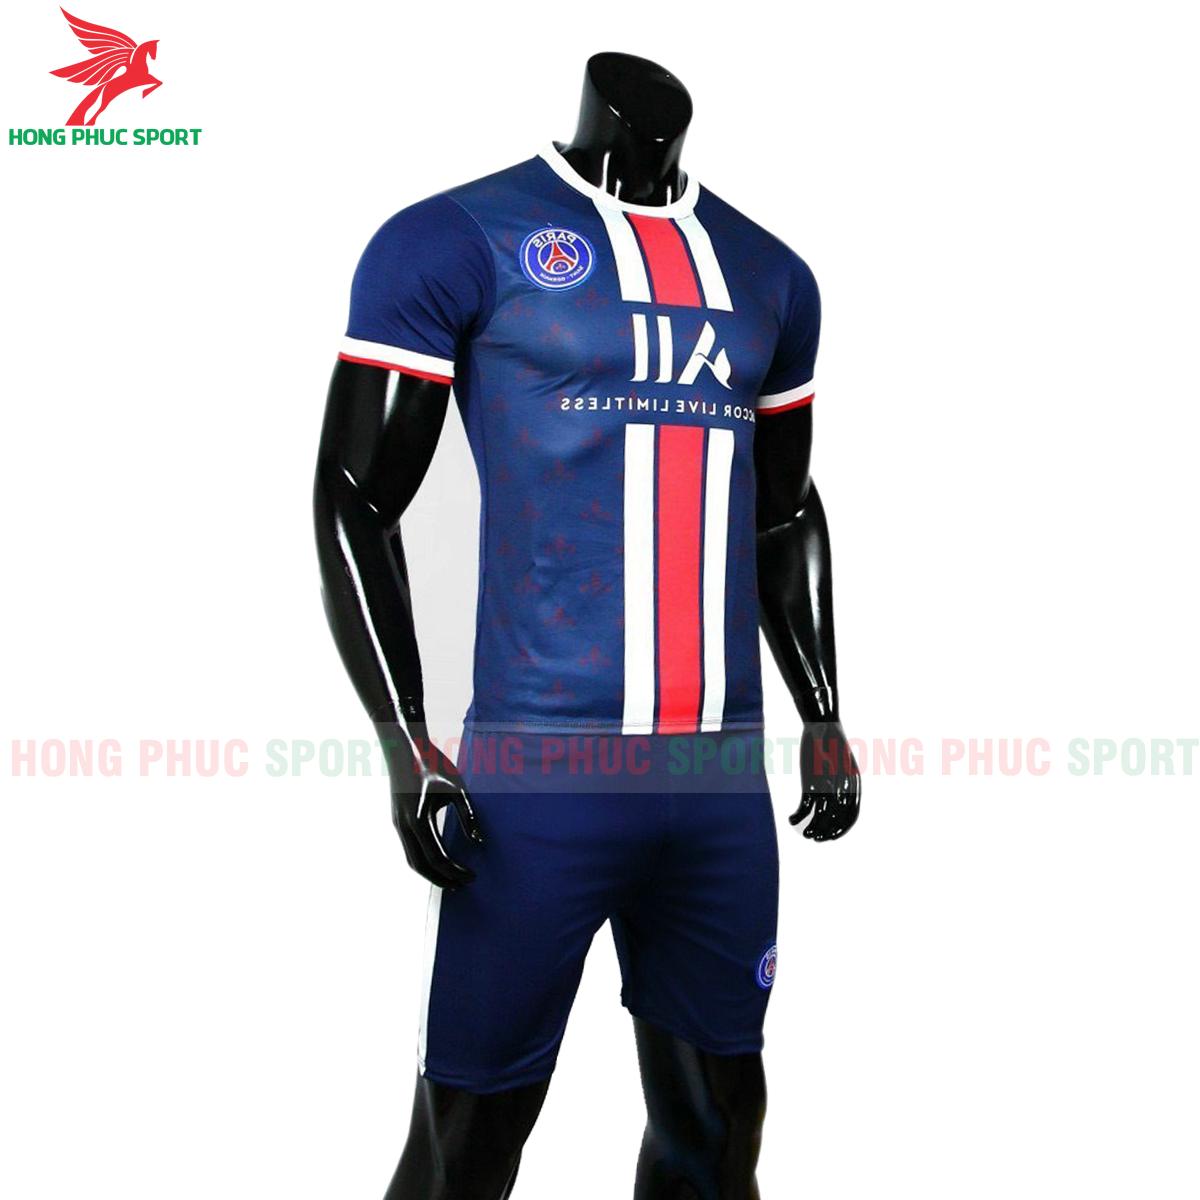 https://cdn.hongphucsport.com/unsafe/s4.shopbay.vn/files/285/ao-bong-da-san-nha-paris-saint-germain-2021-2022-6074fa0929627.png